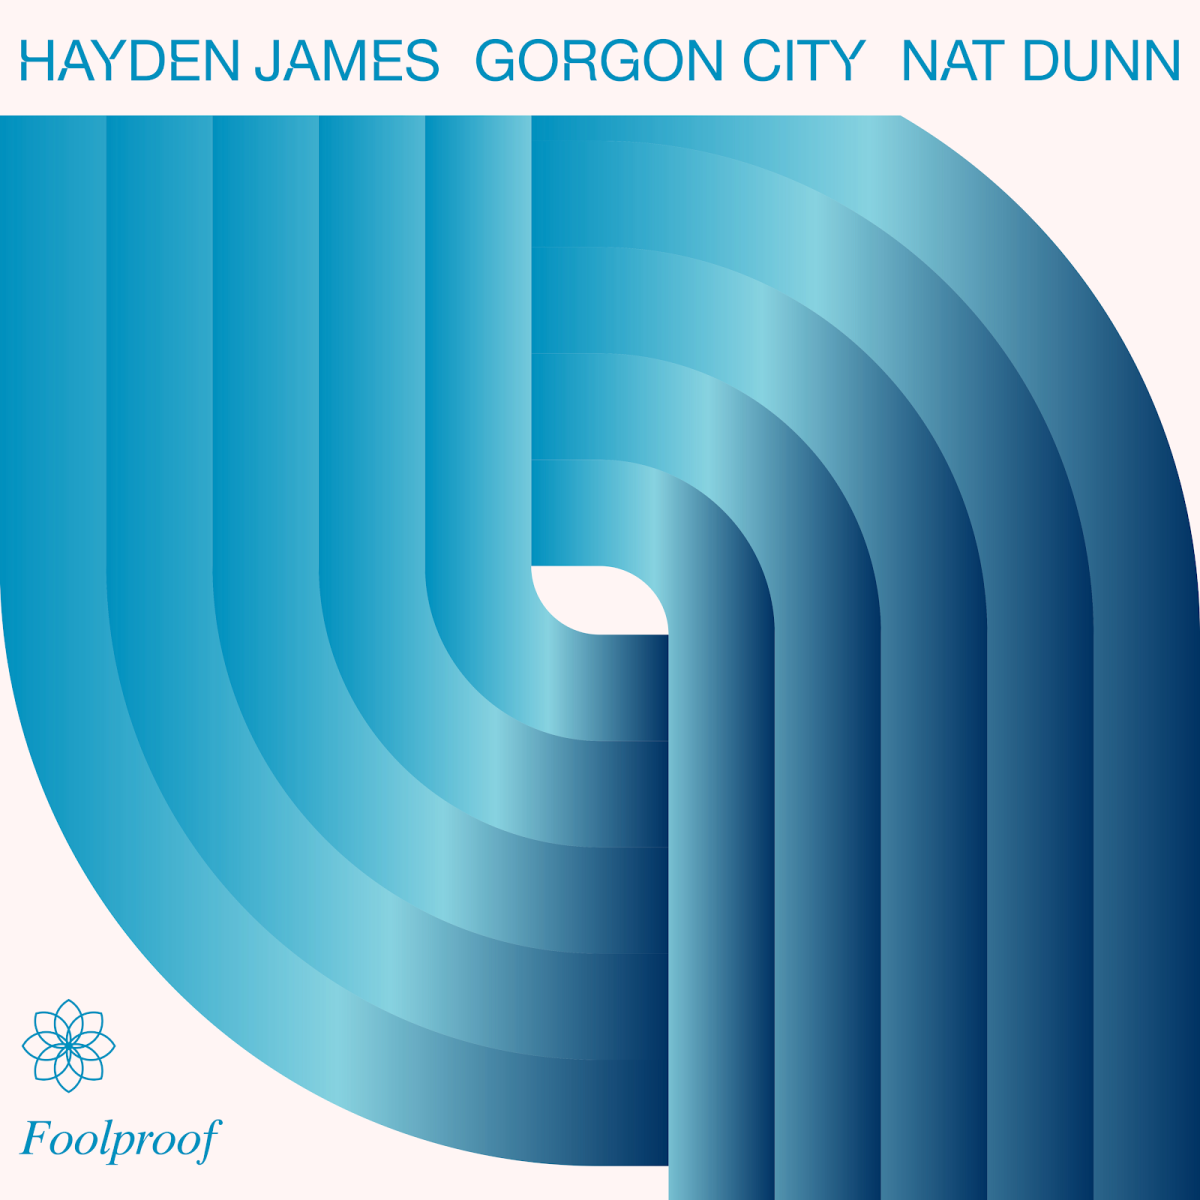 Hayden James, Gorgon City, Nat Dunn - Foolproof